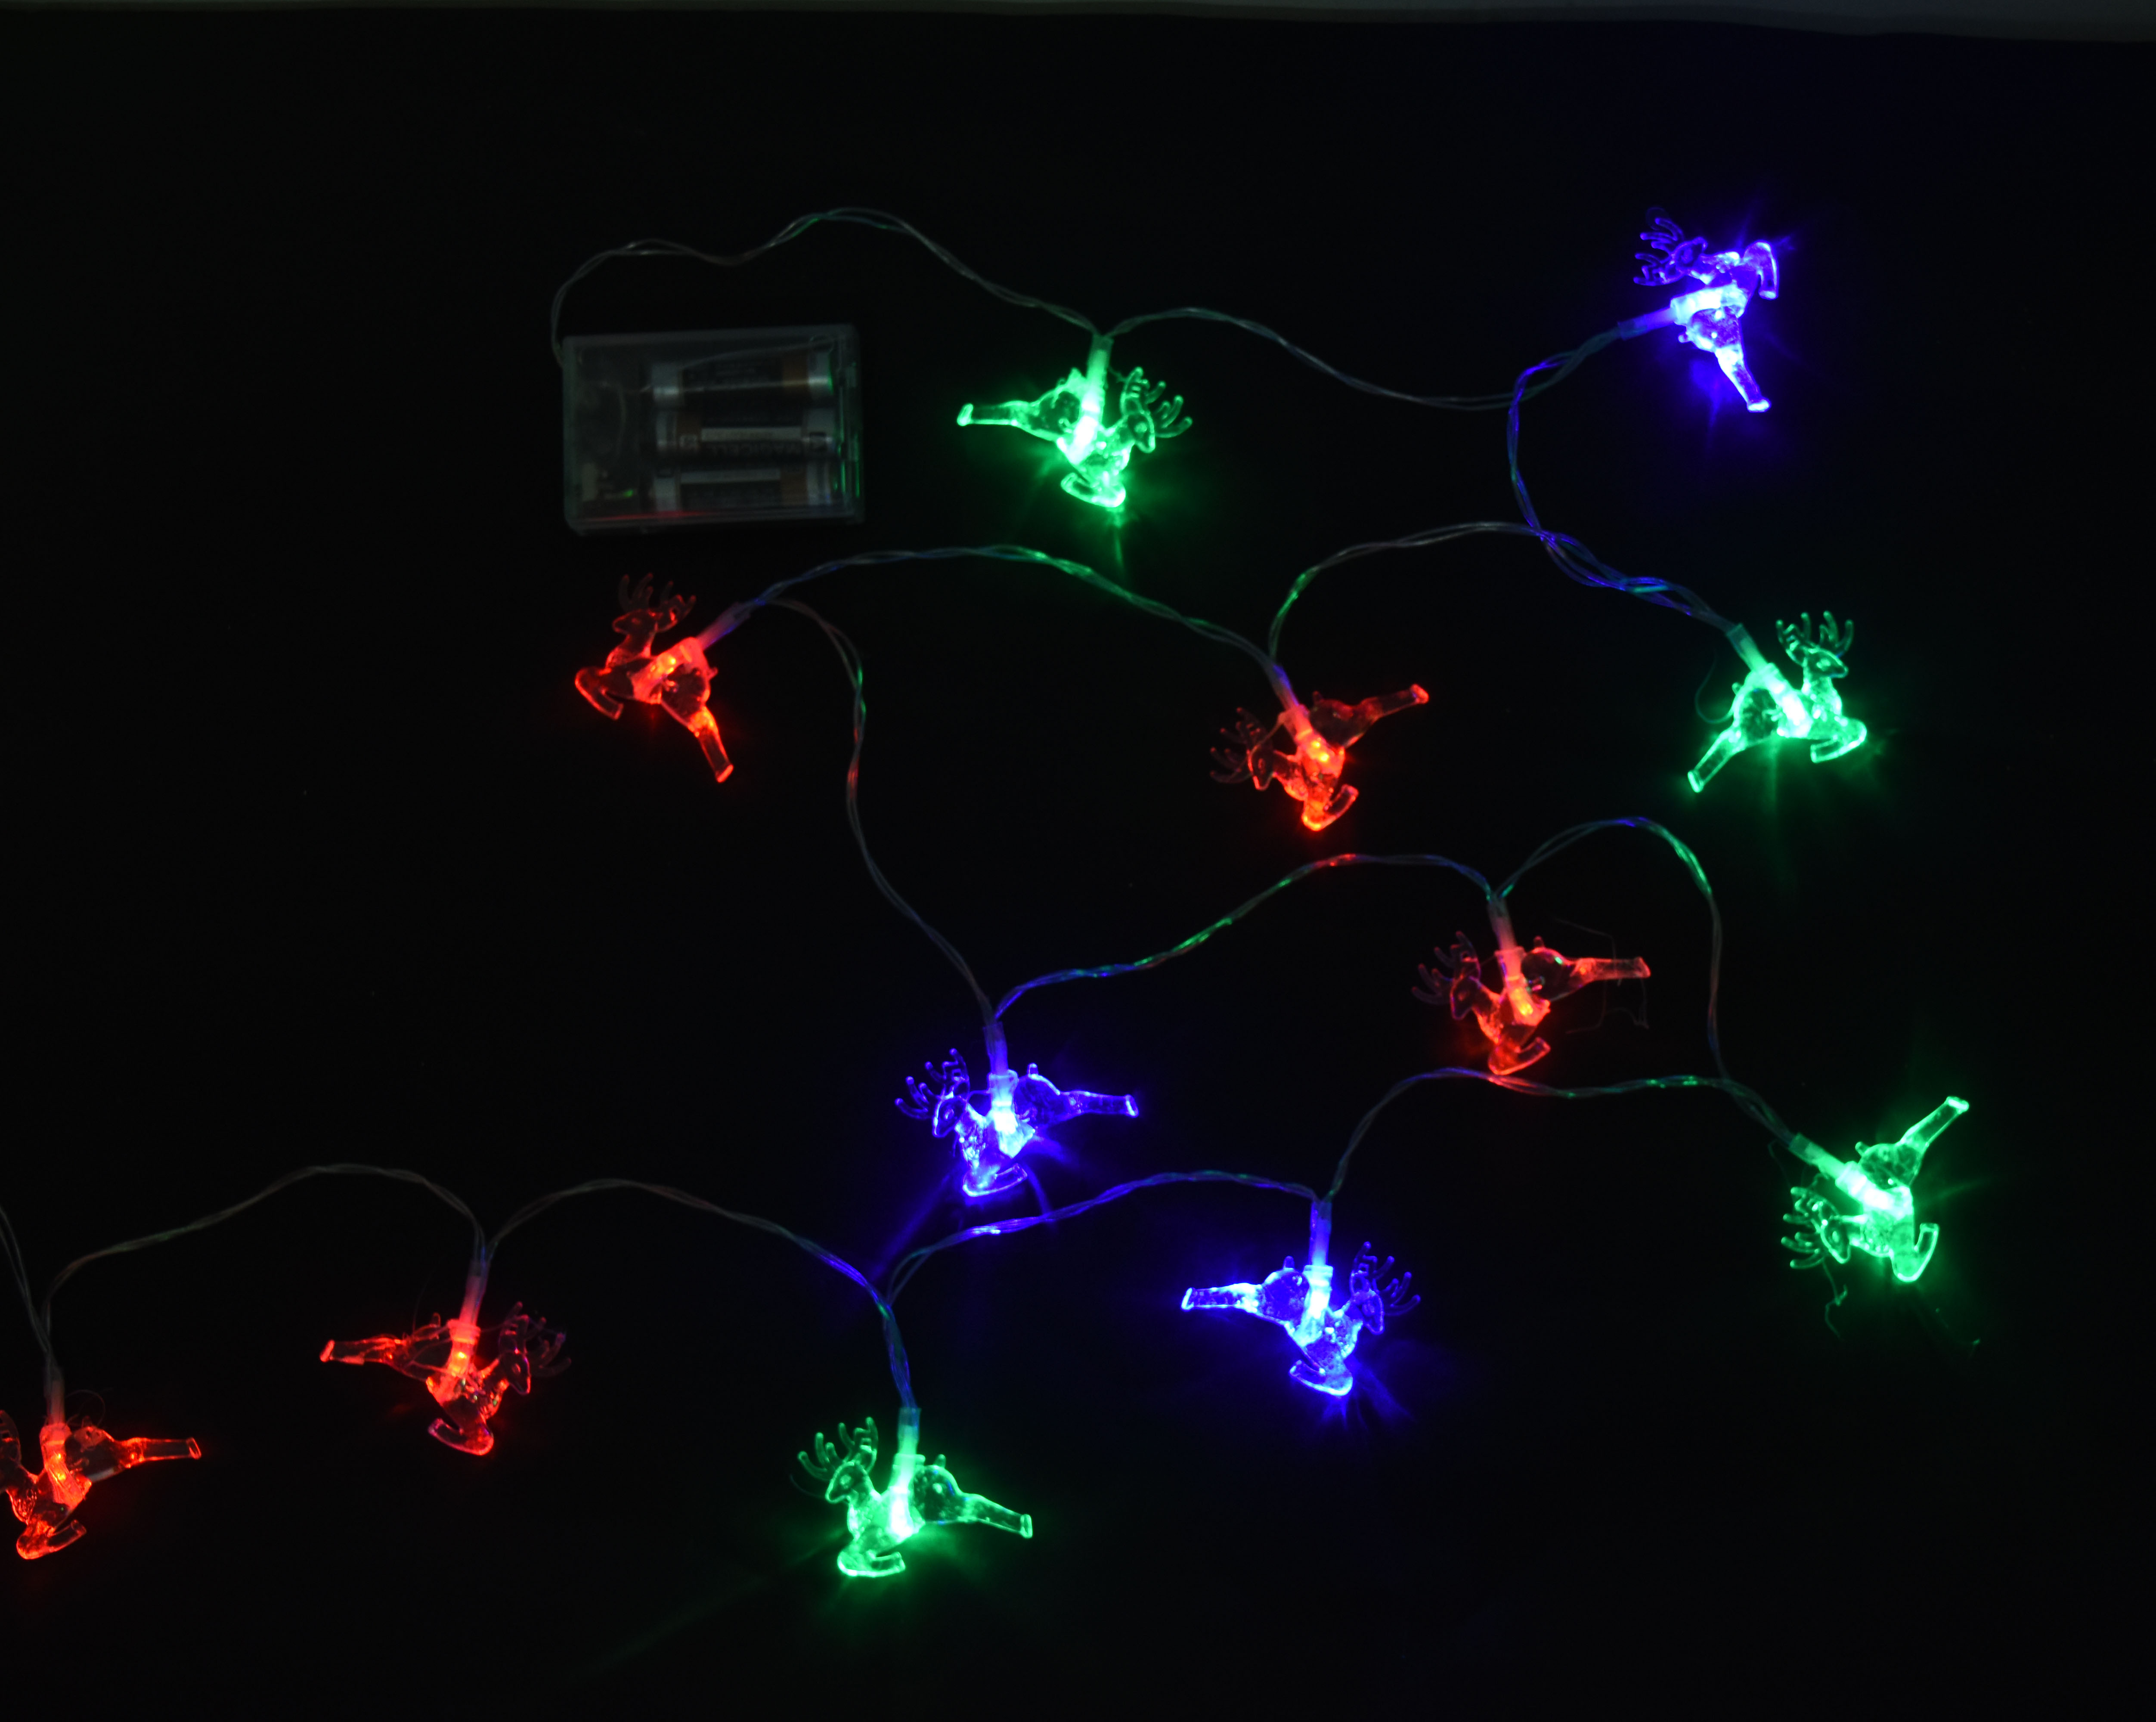 X射線【X411571】20燈LED奔鹿電池燈(彩光),聖誕樹/LED/聖誕燈飾/造型燈/聖誕佈置/裝飾燈/聖誕樹